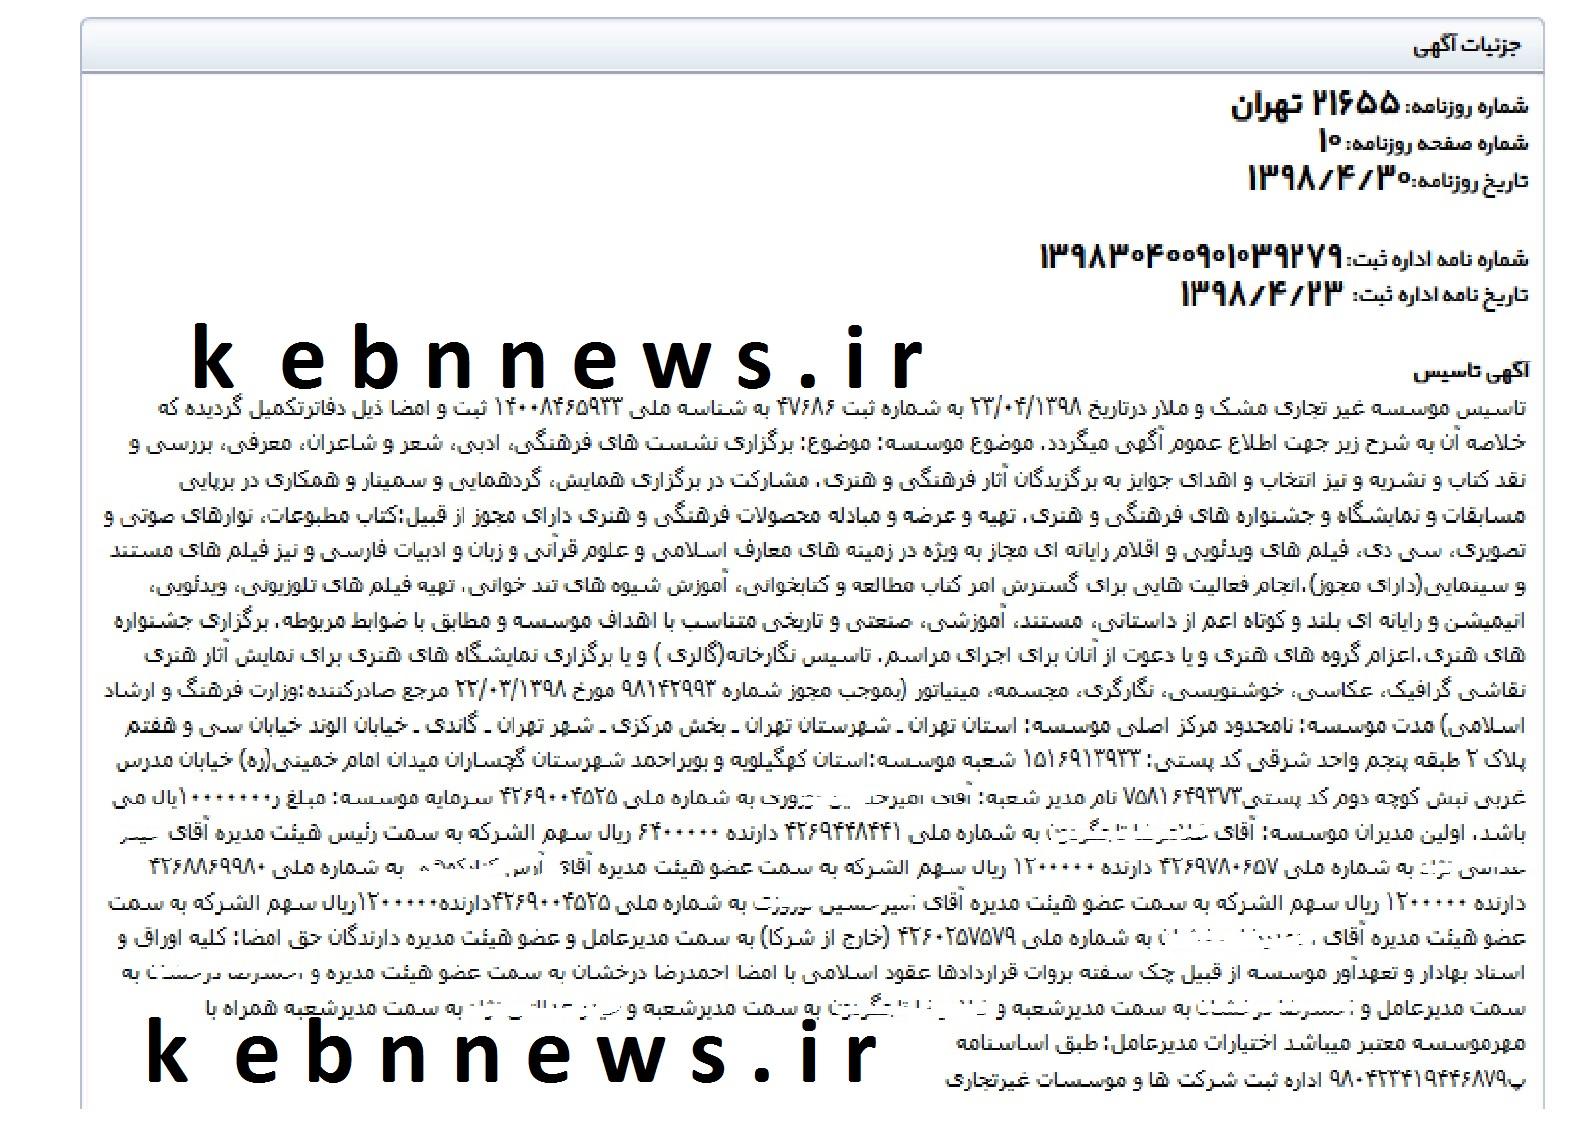 http://www.kebnanews.ir/images/docs/files/000412/nf00412099-1.jpg